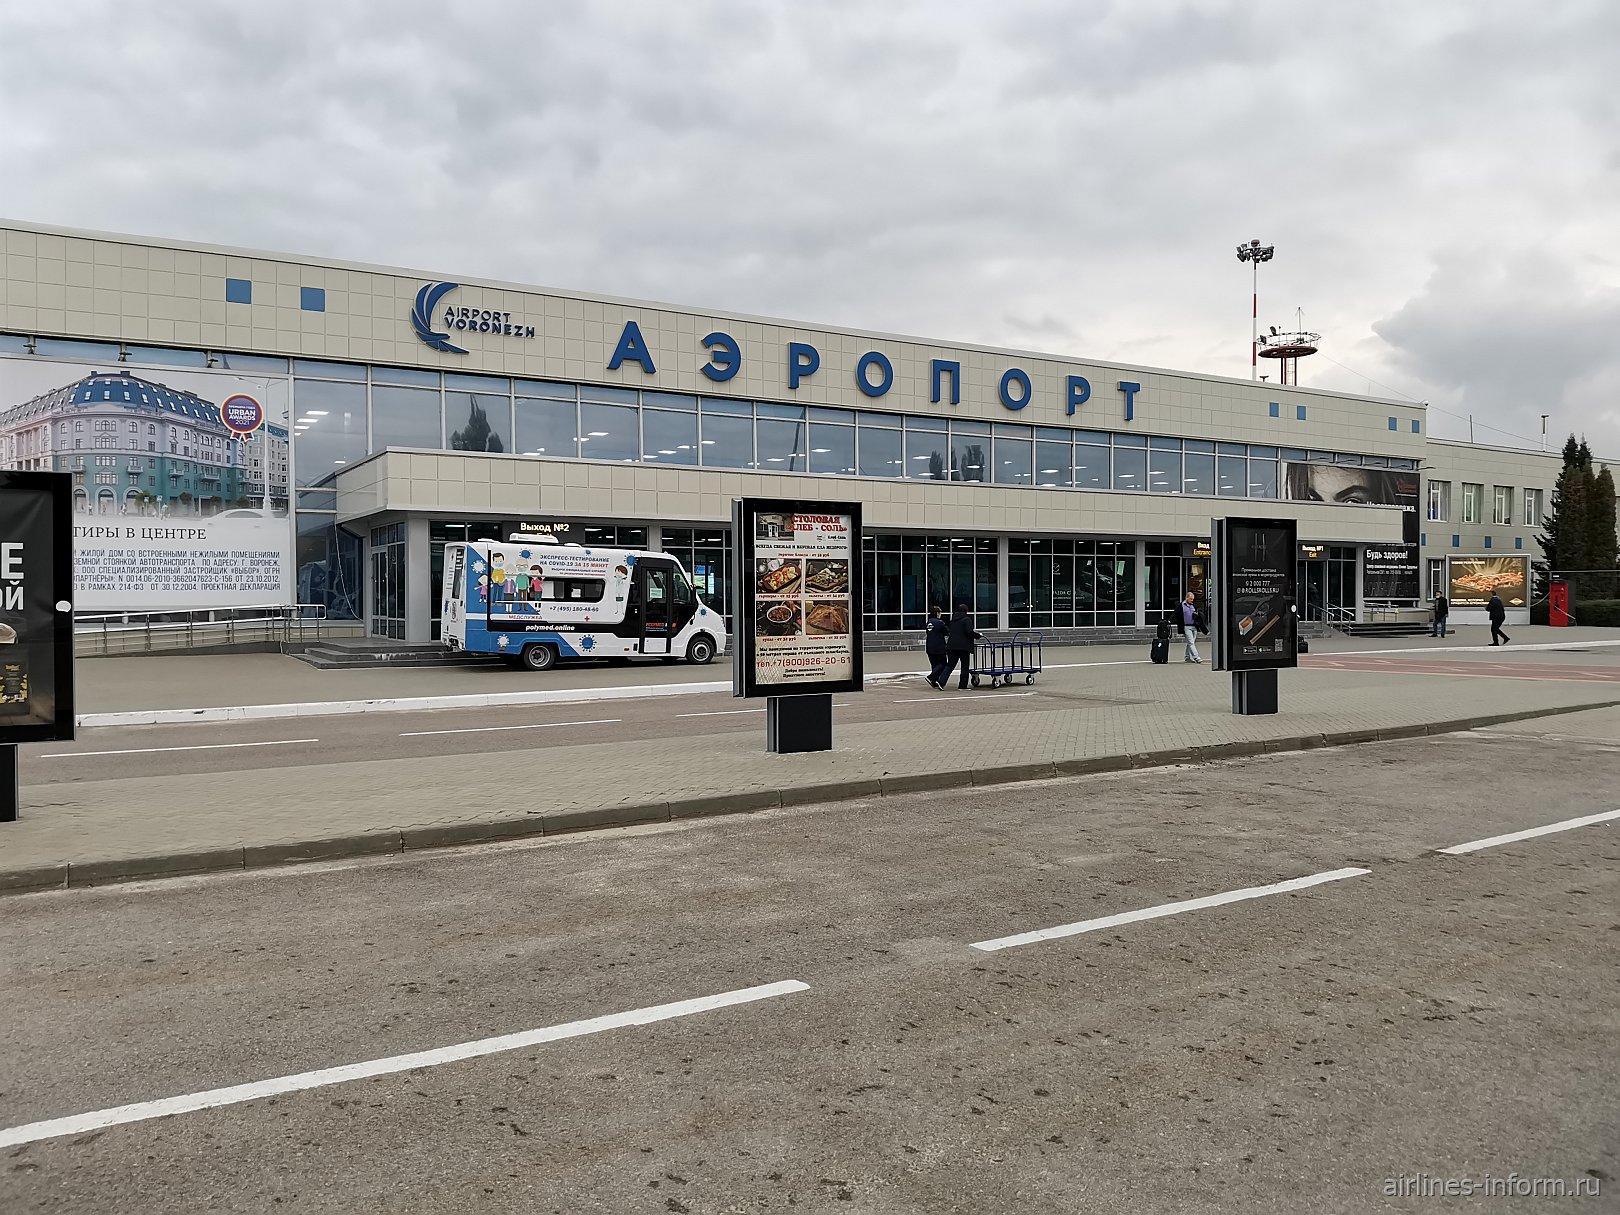 Аэровокзал аэропорта Воронеж Чертовицкое